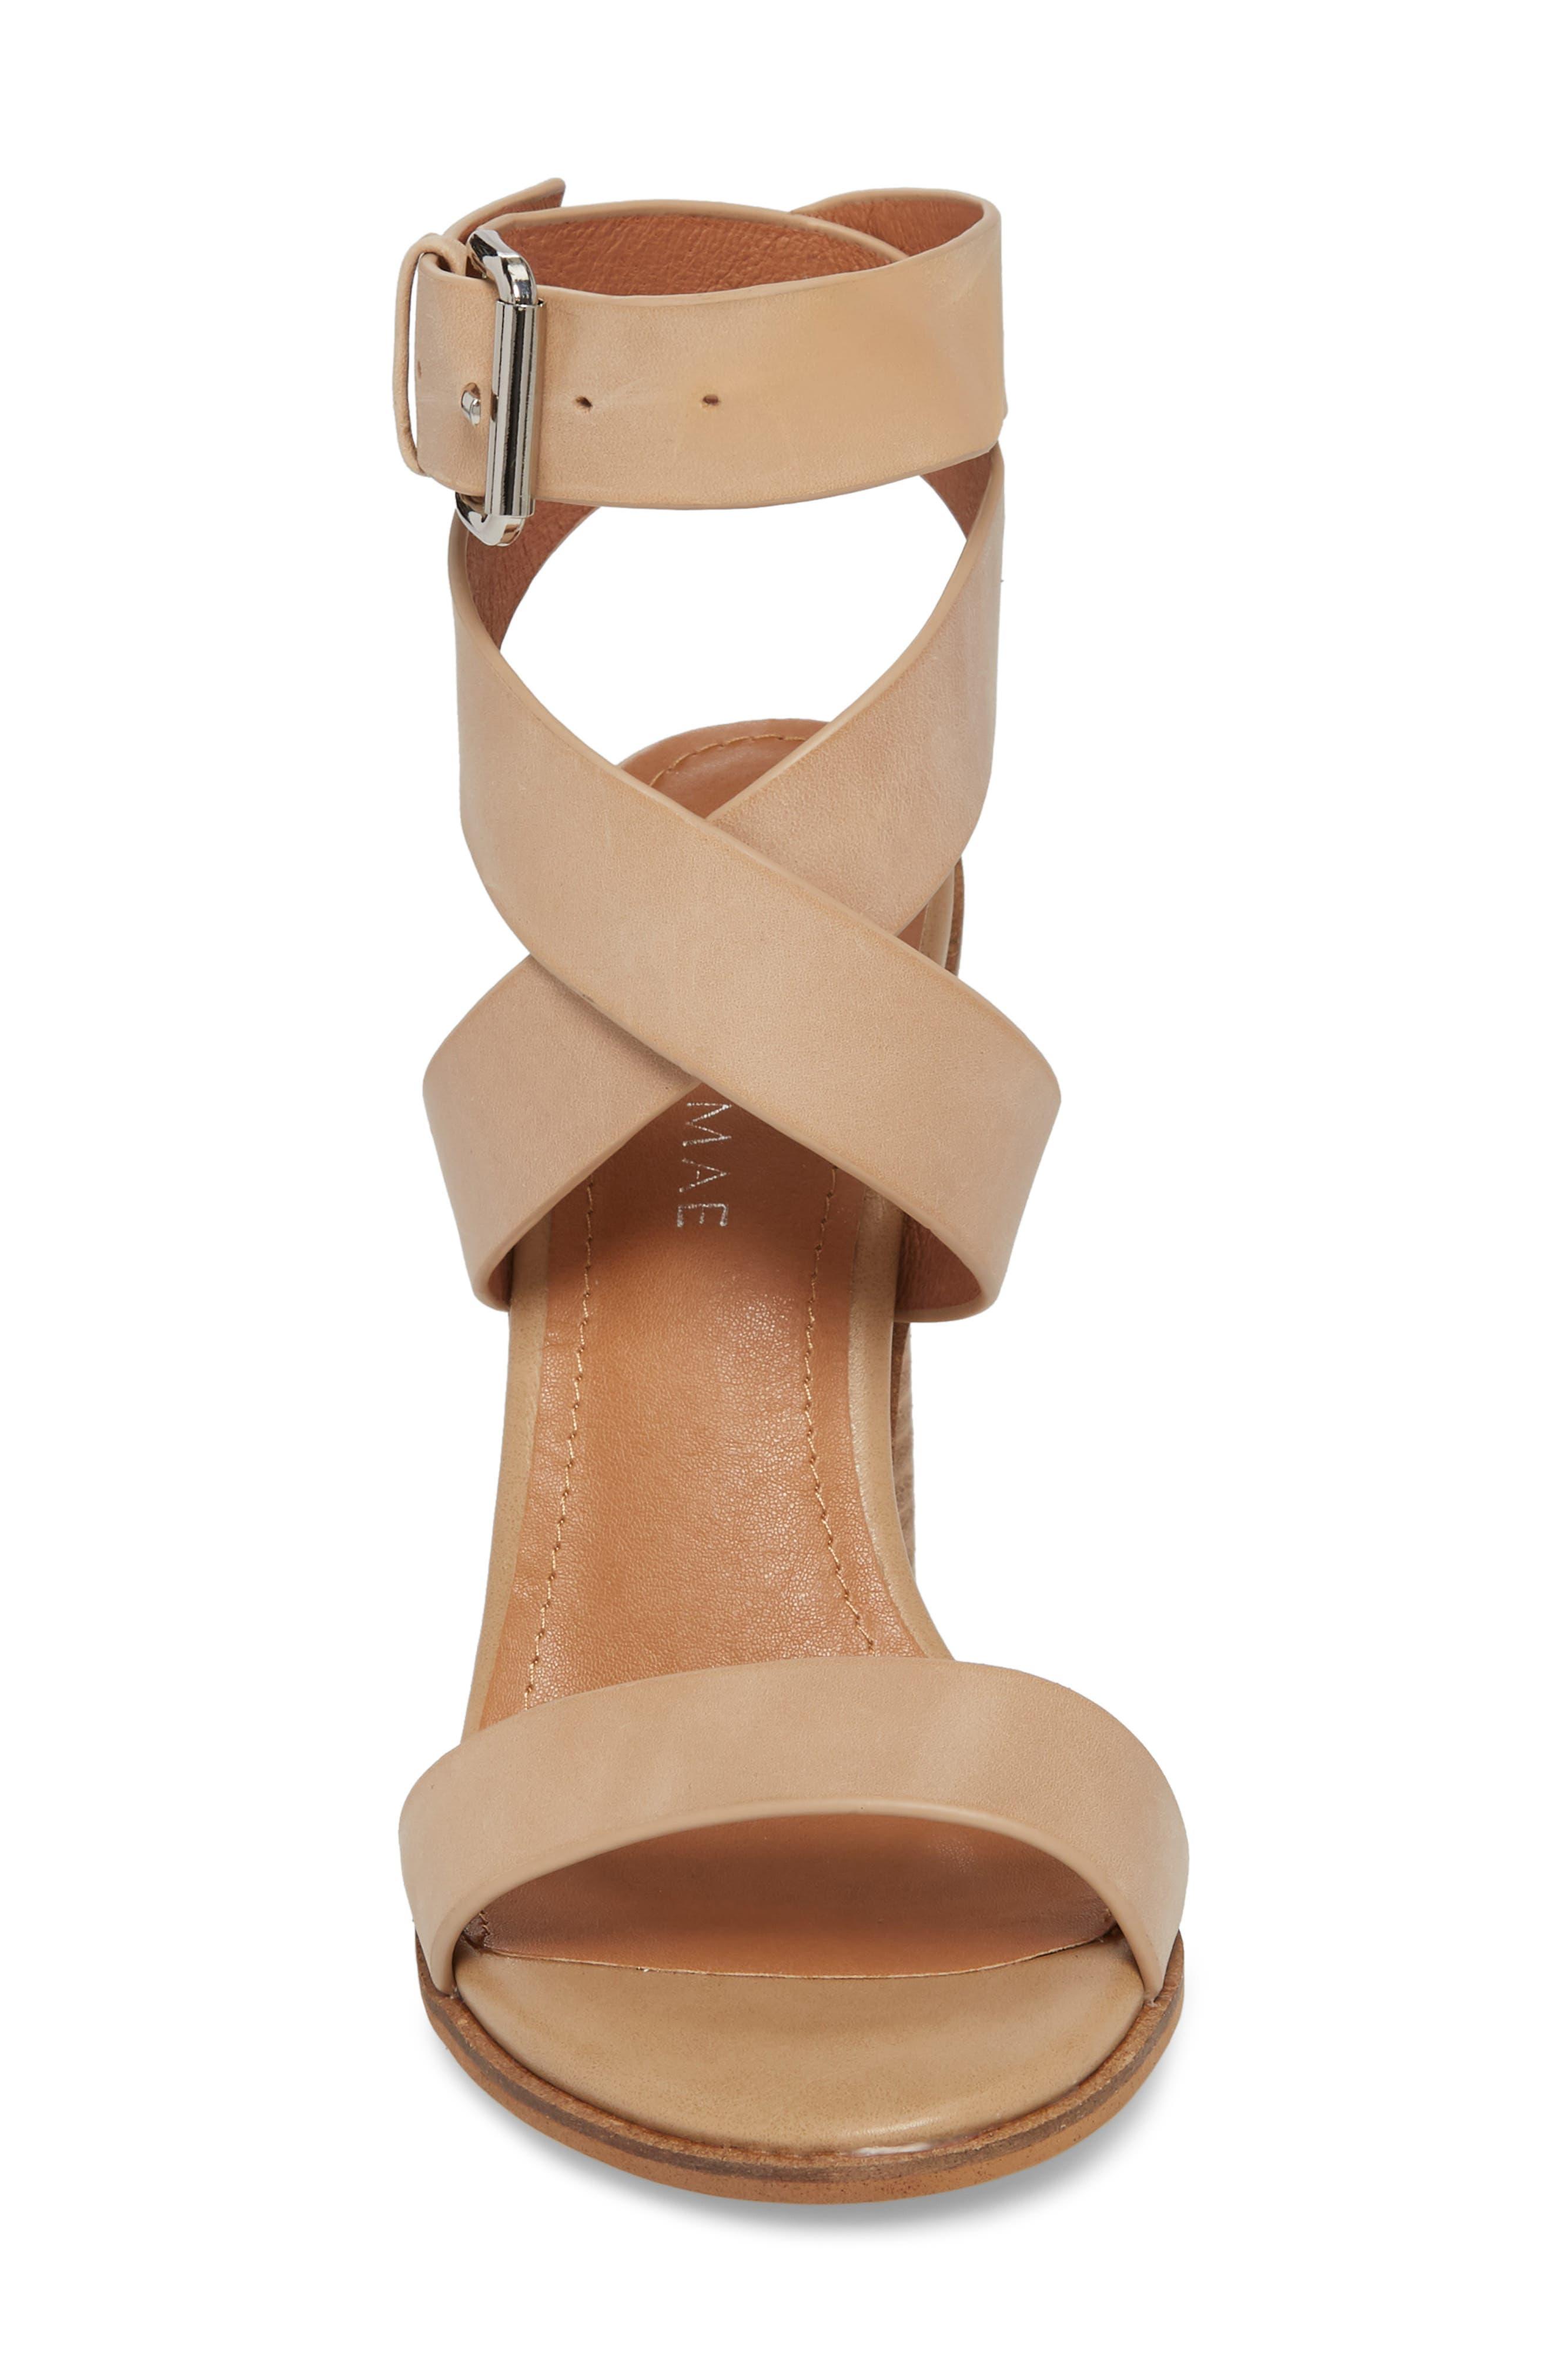 Abaala Cross Strap Sandal,                             Alternate thumbnail 4, color,                             Natural Leather